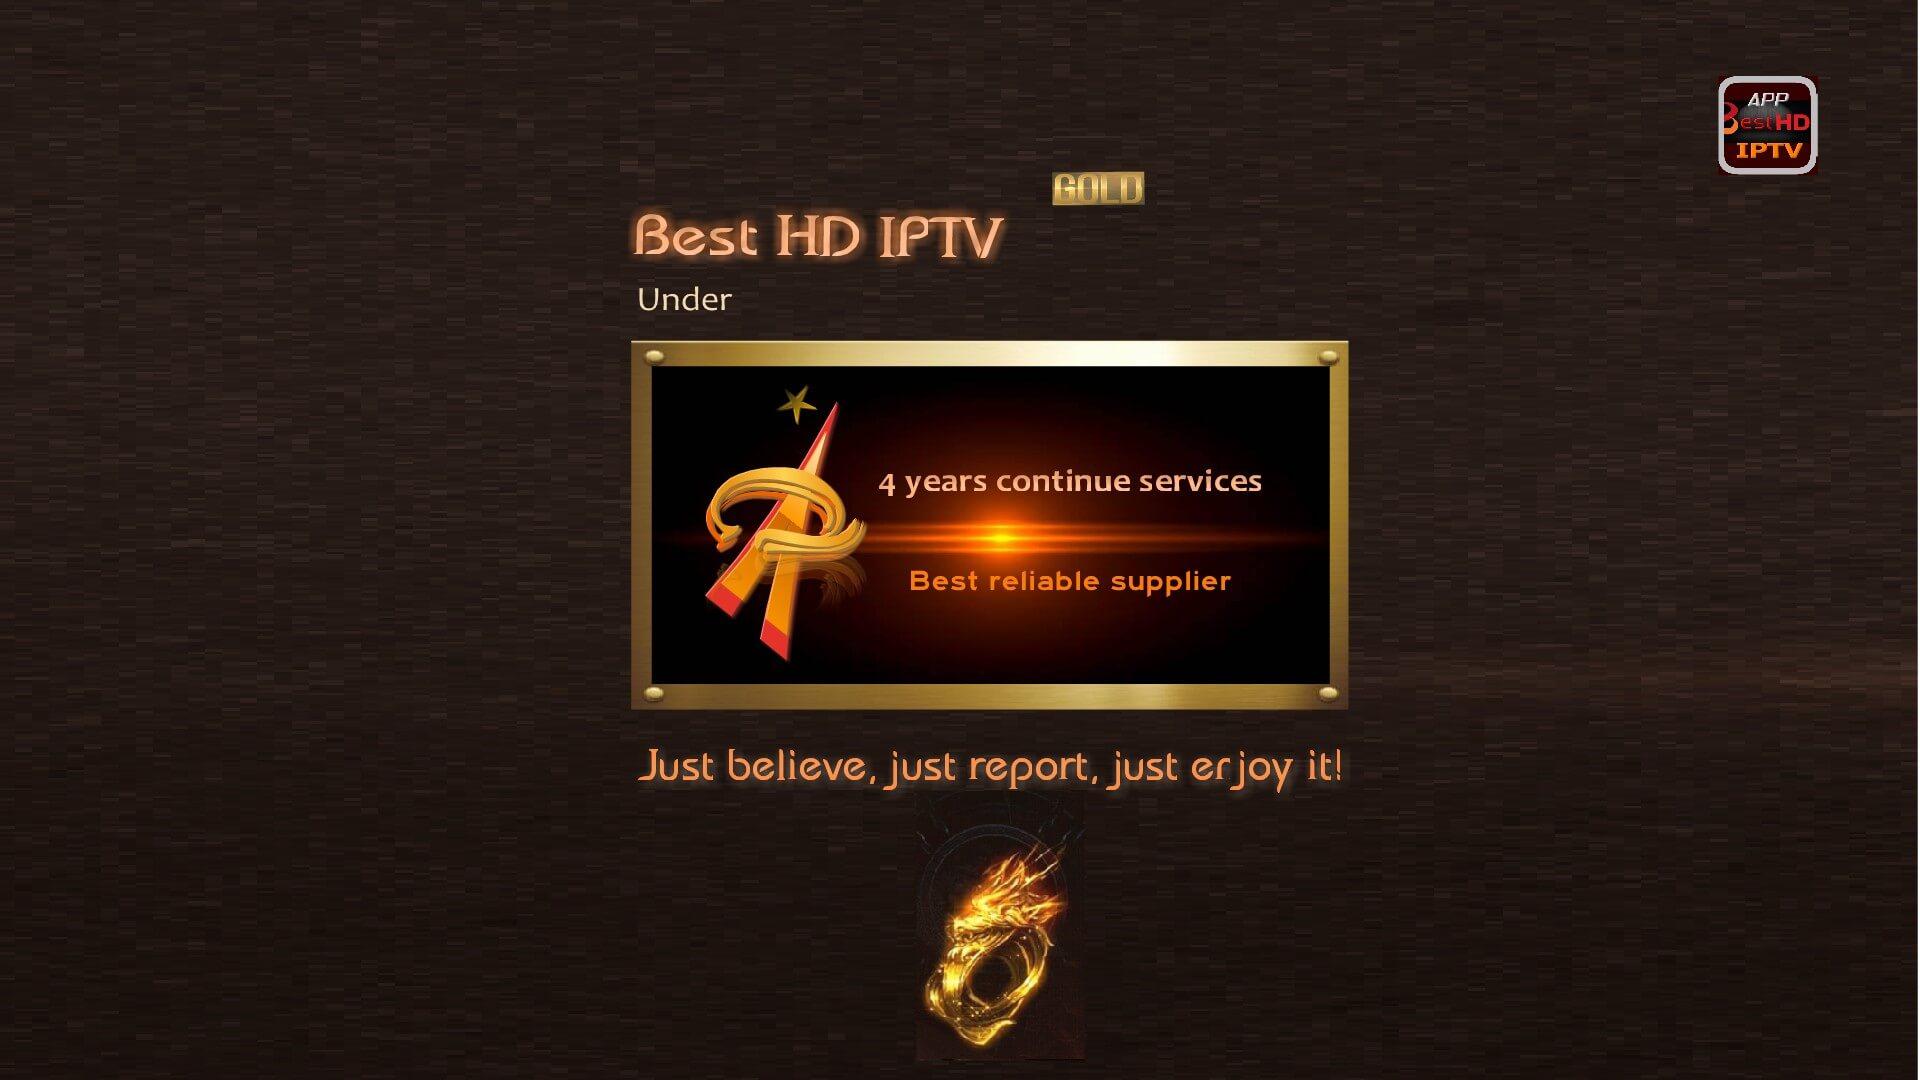 BEST HD IPTV GOLD